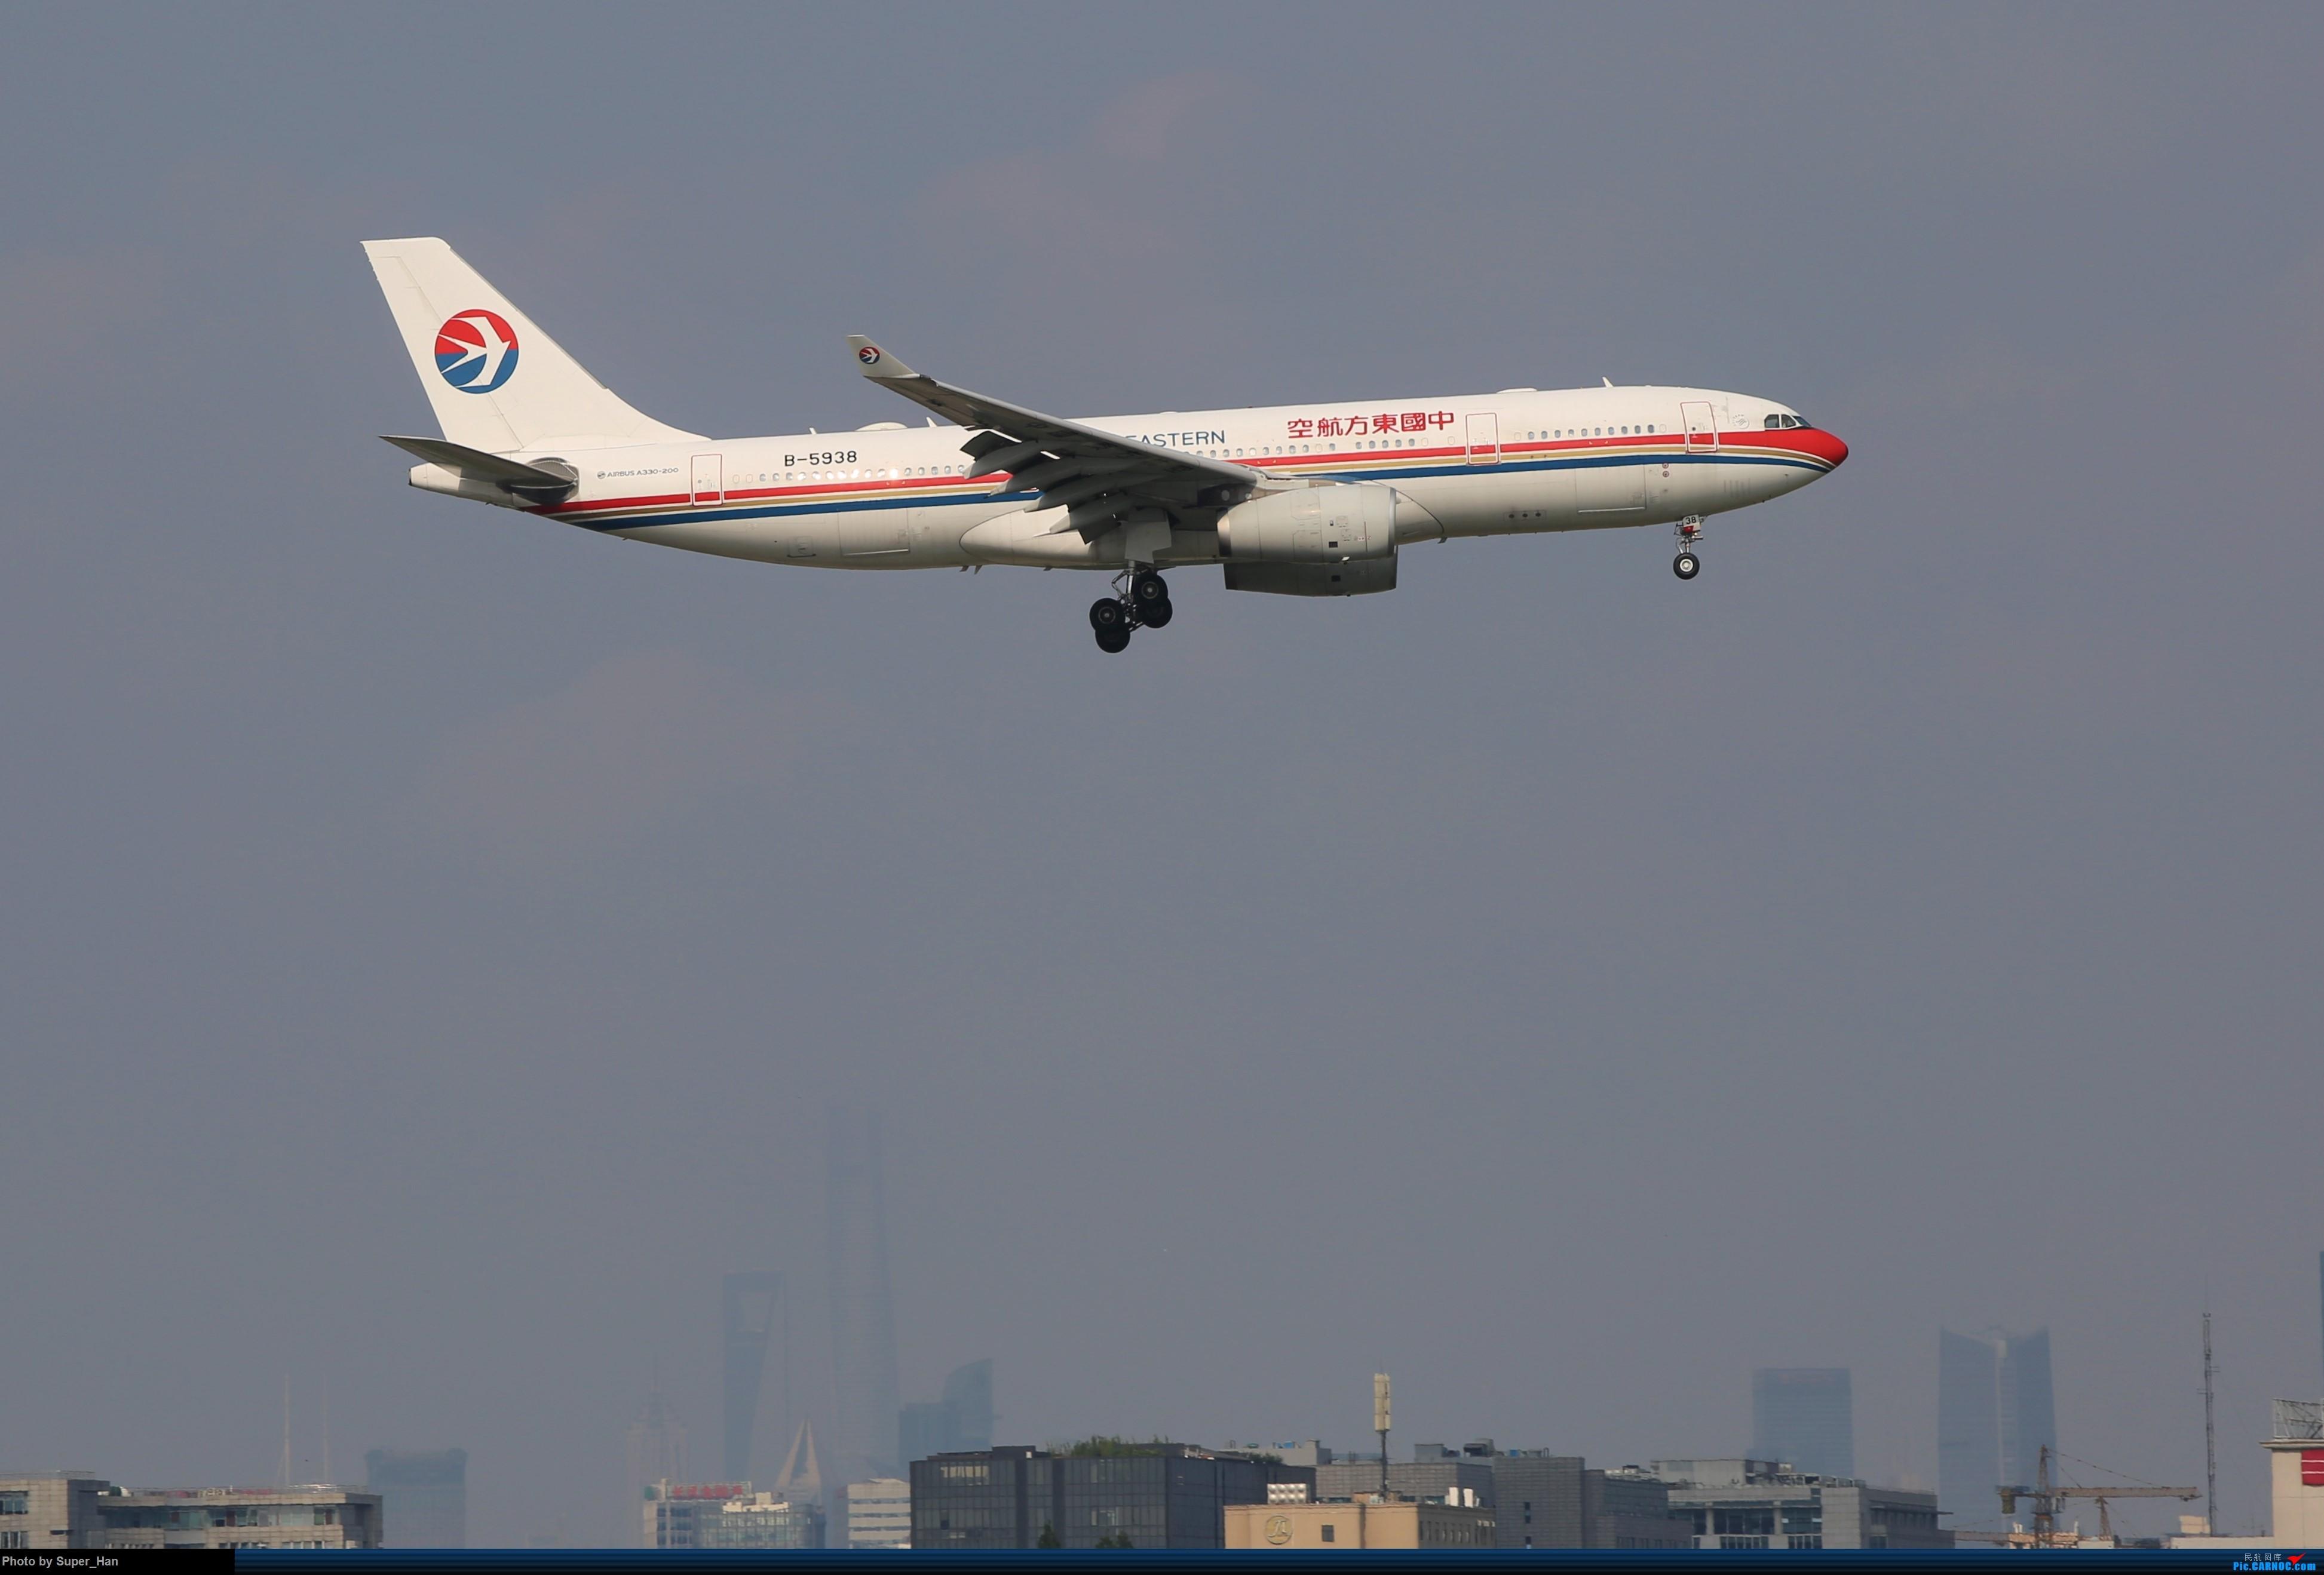 Re:[原创]【杭州飞友会】浦东之上 AIRBUS A330-200 B-5938 中国上海虹桥国际机场